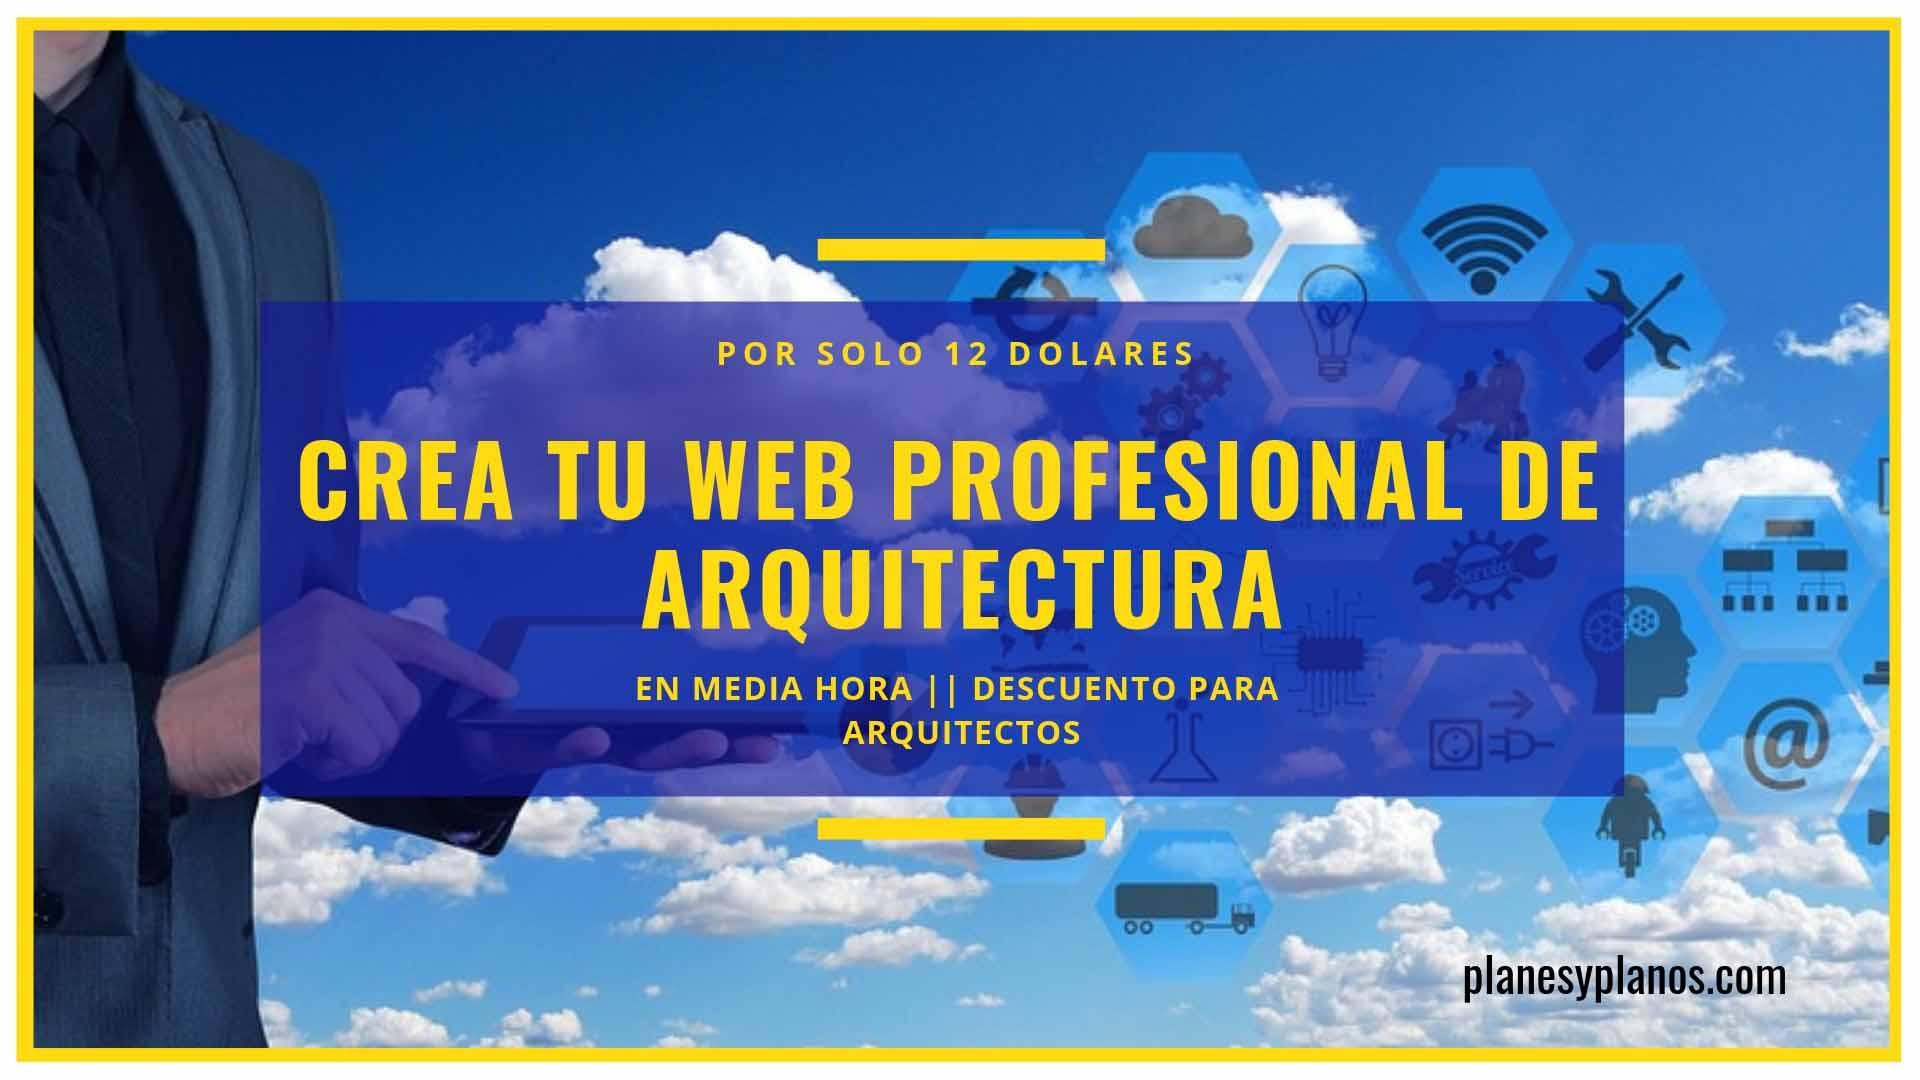 CREA TU WEB DE ARQUITECTURA DESCUENTO